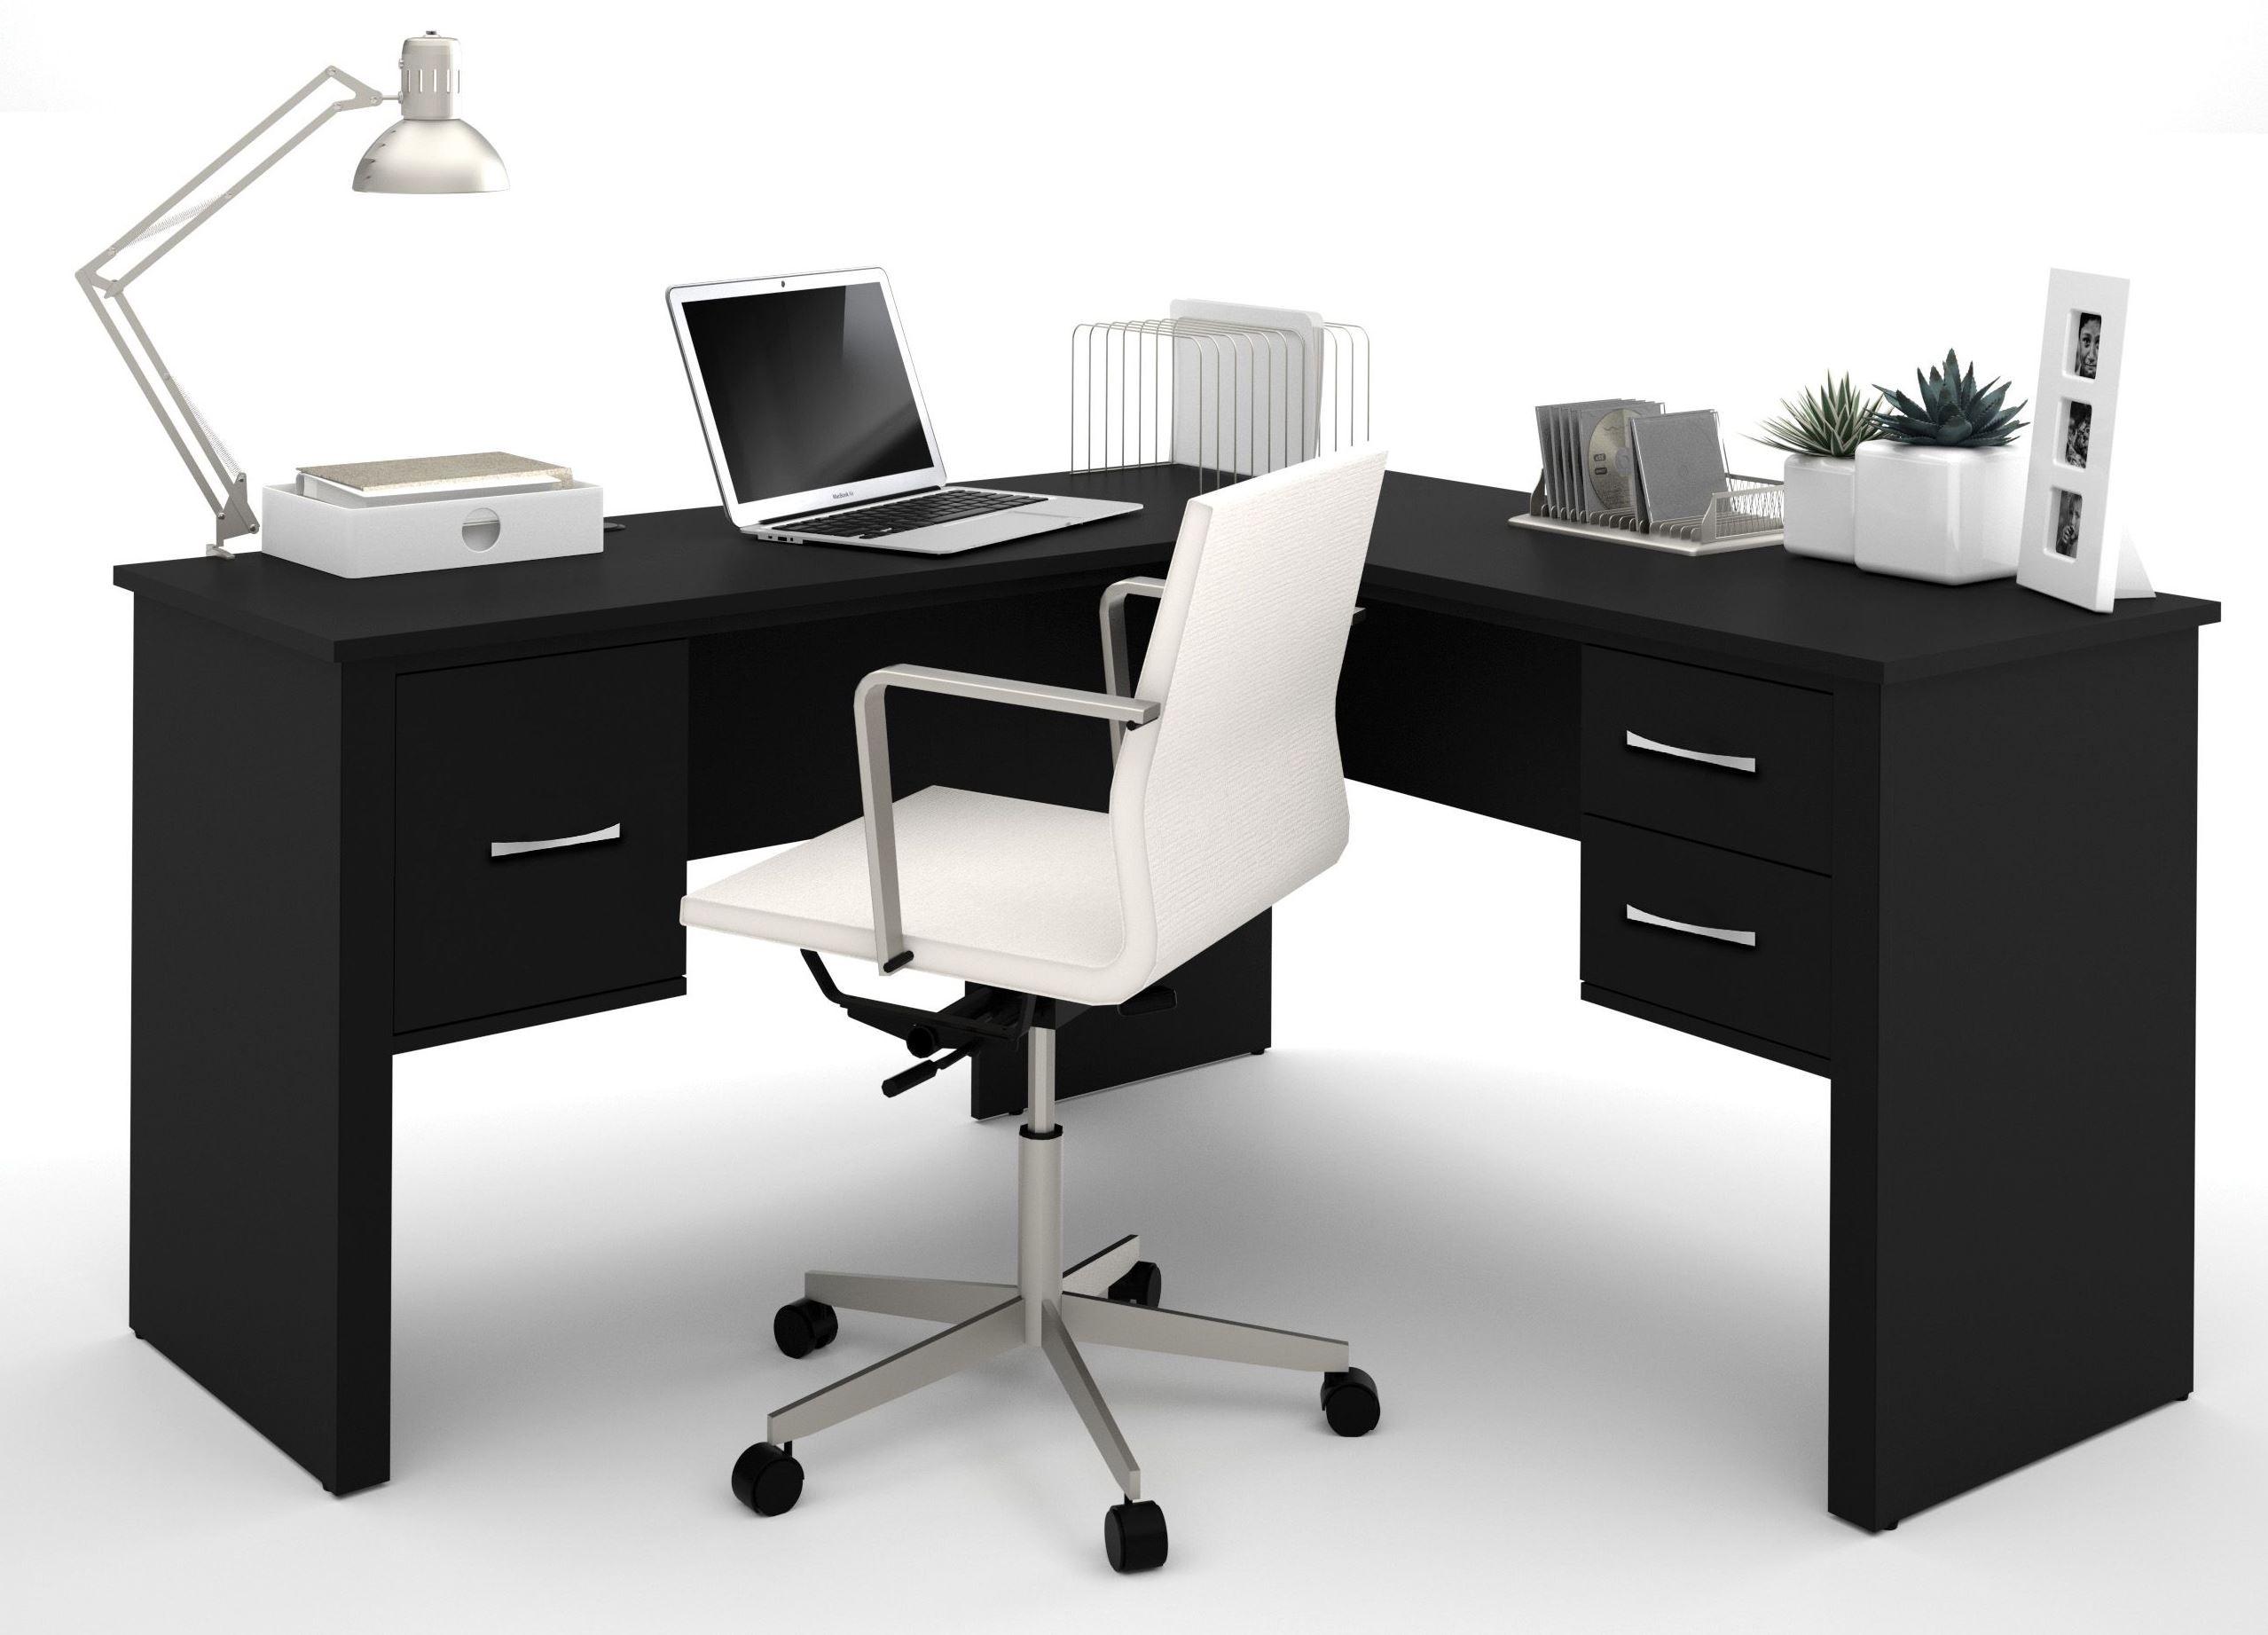 Somerville Black L Shaped Desk From Bestar 45421 1118